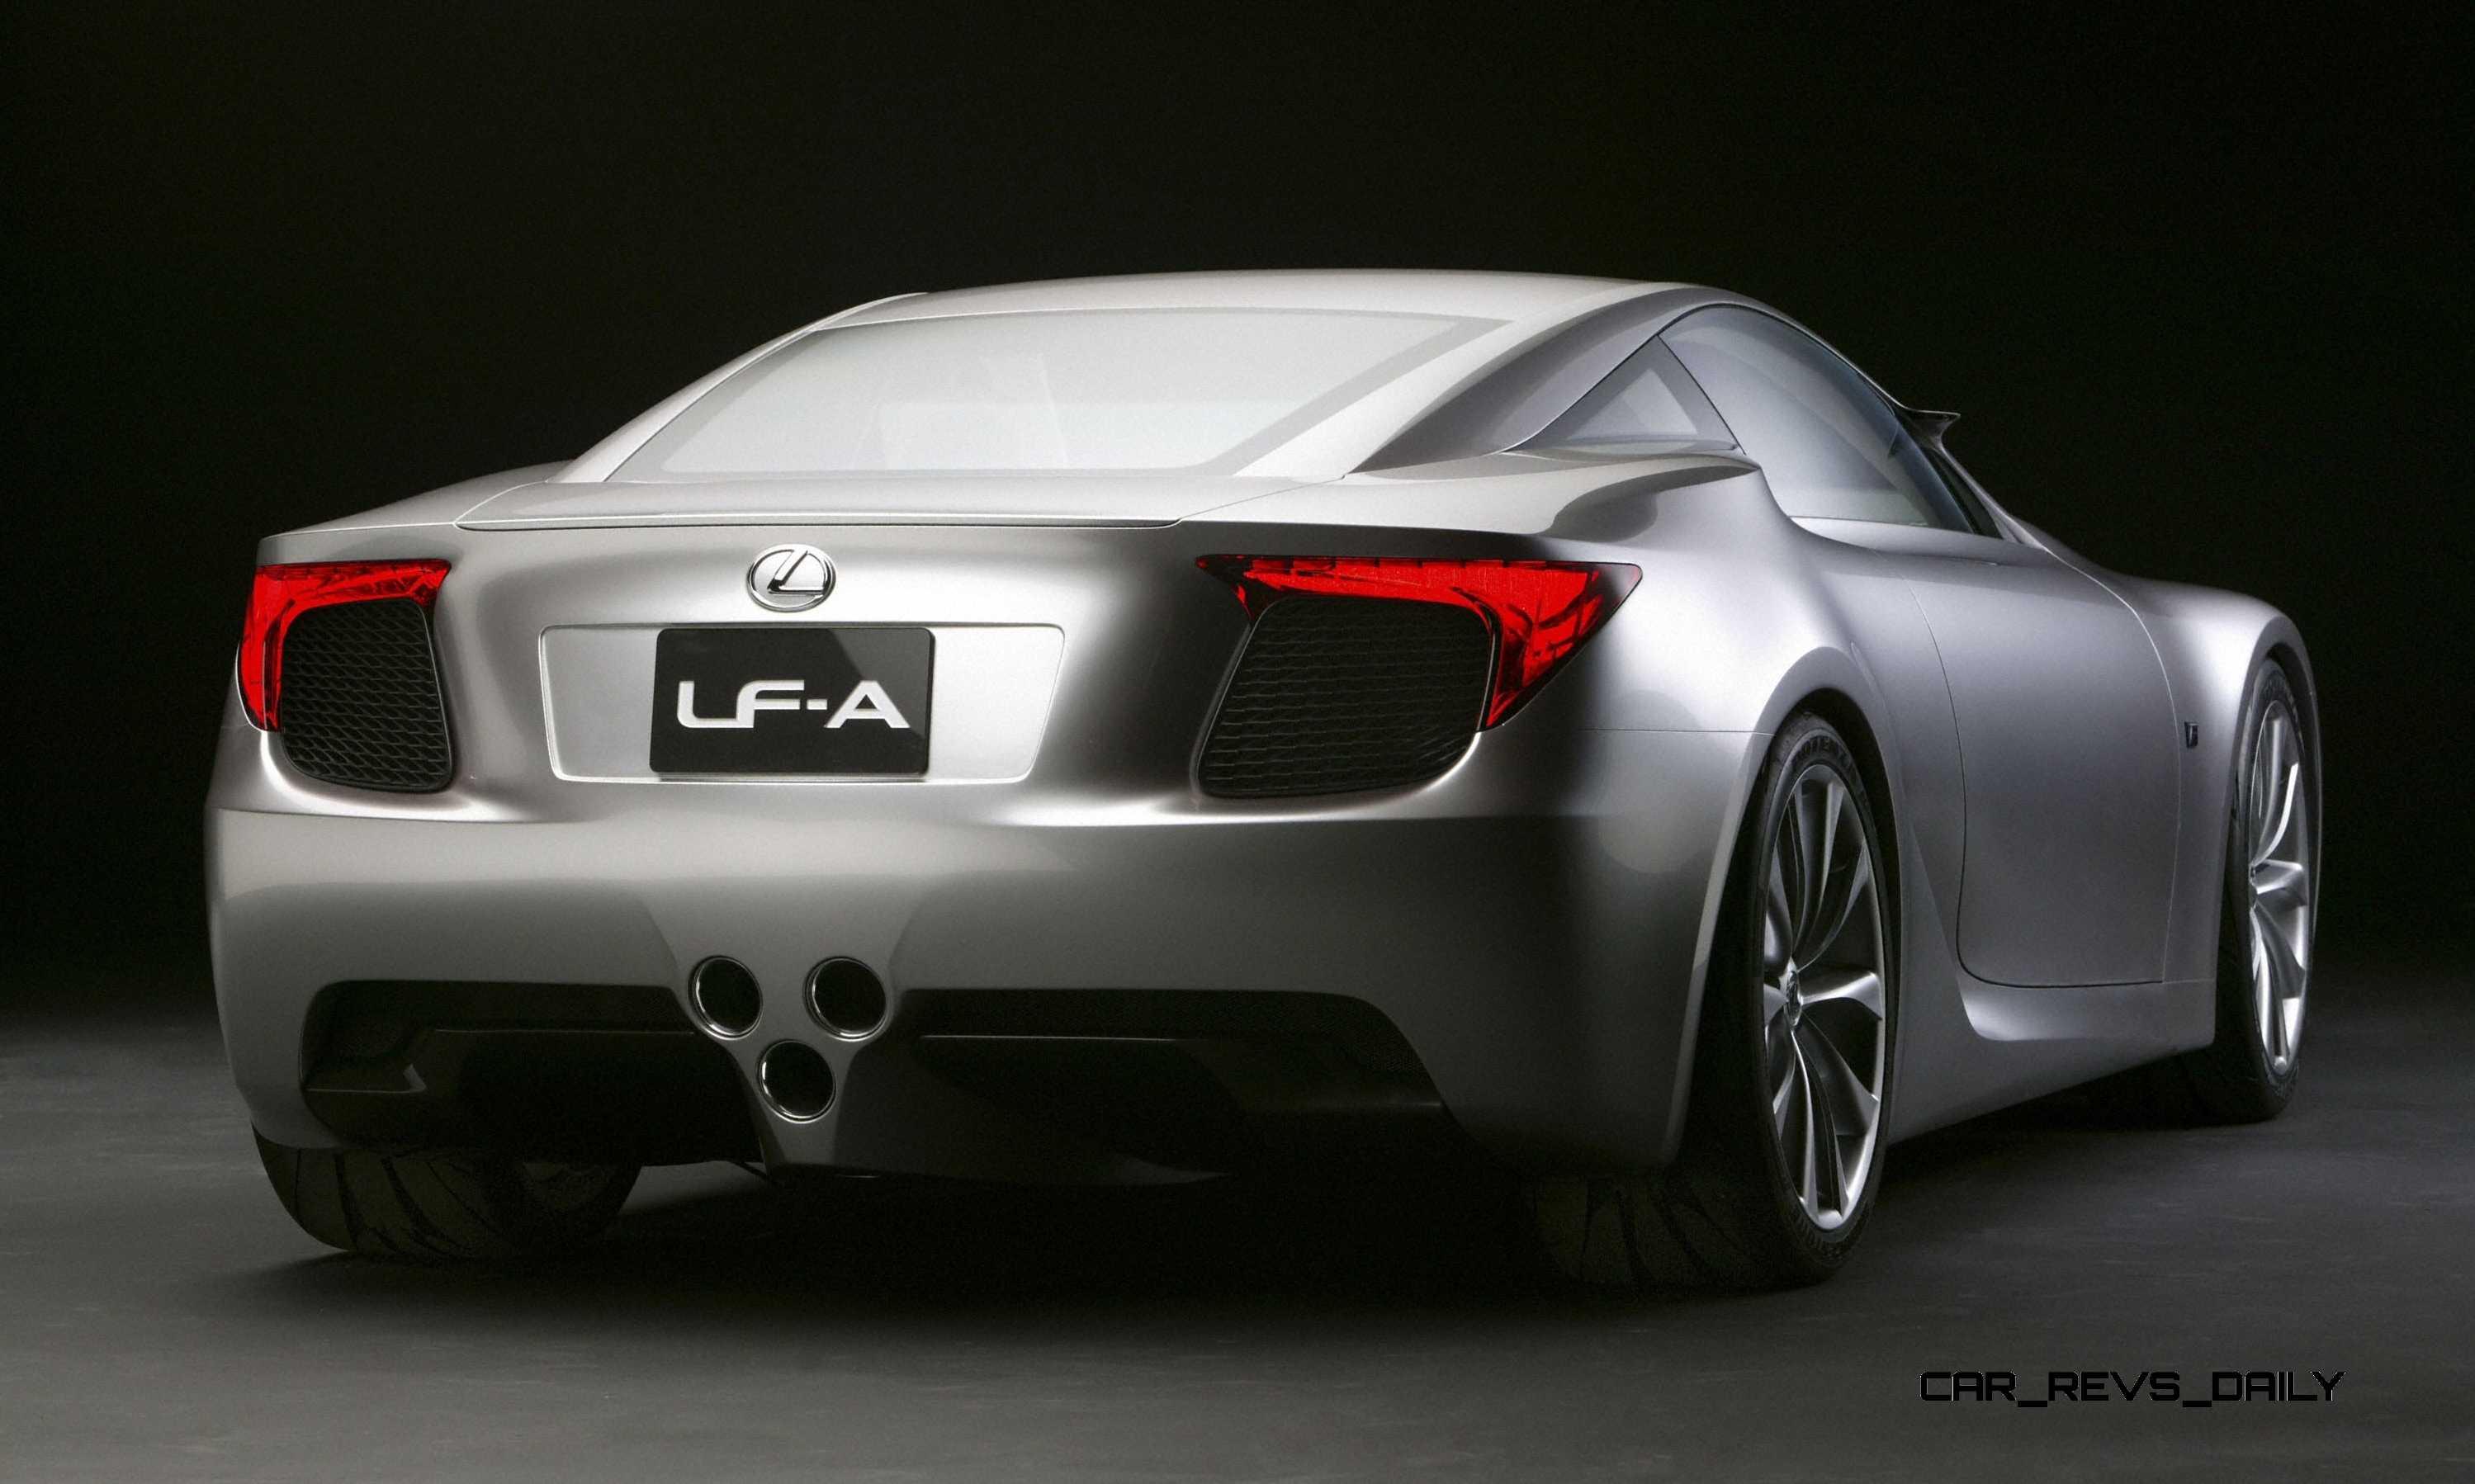 http://www.car-revs-daily.com/wp-content/uploads/2014/10/2005-Lexus-LFA-Coupe-9.jpg